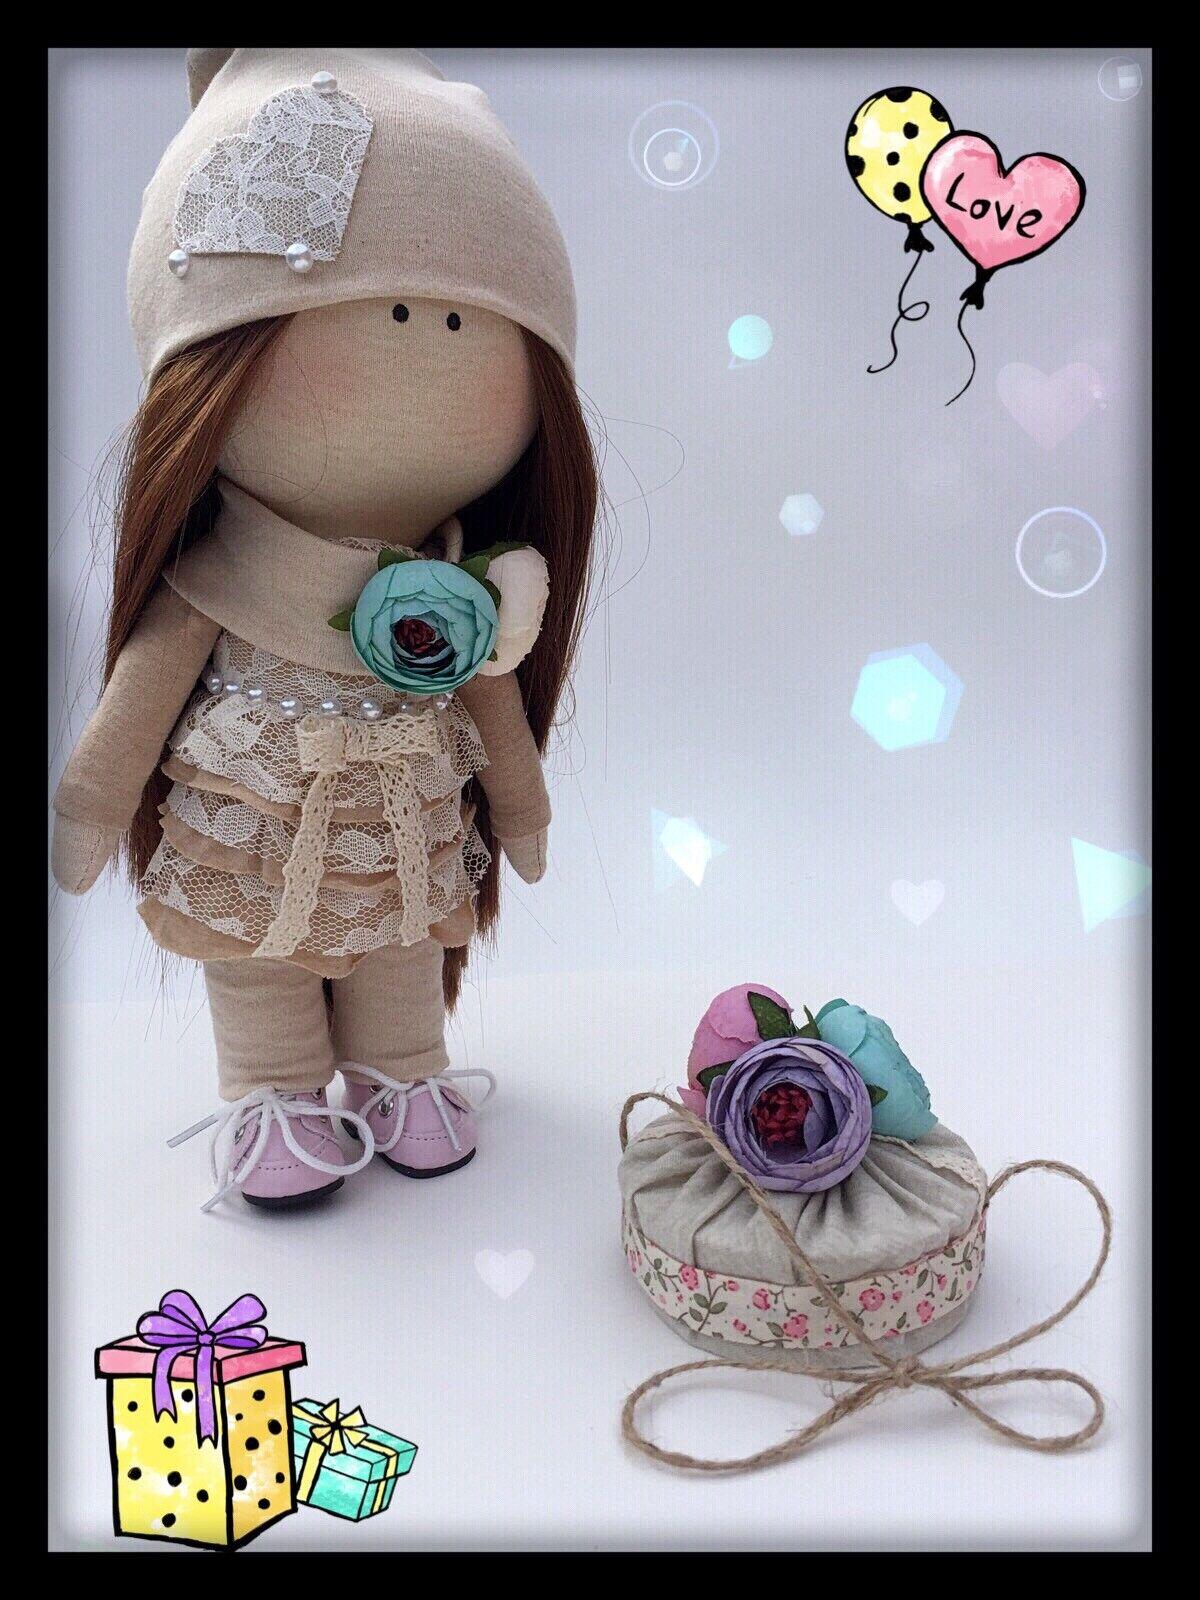 Muñeca Tilda, tela textil muñeca, muñeca, muñeca de colección por artista deseos clarté